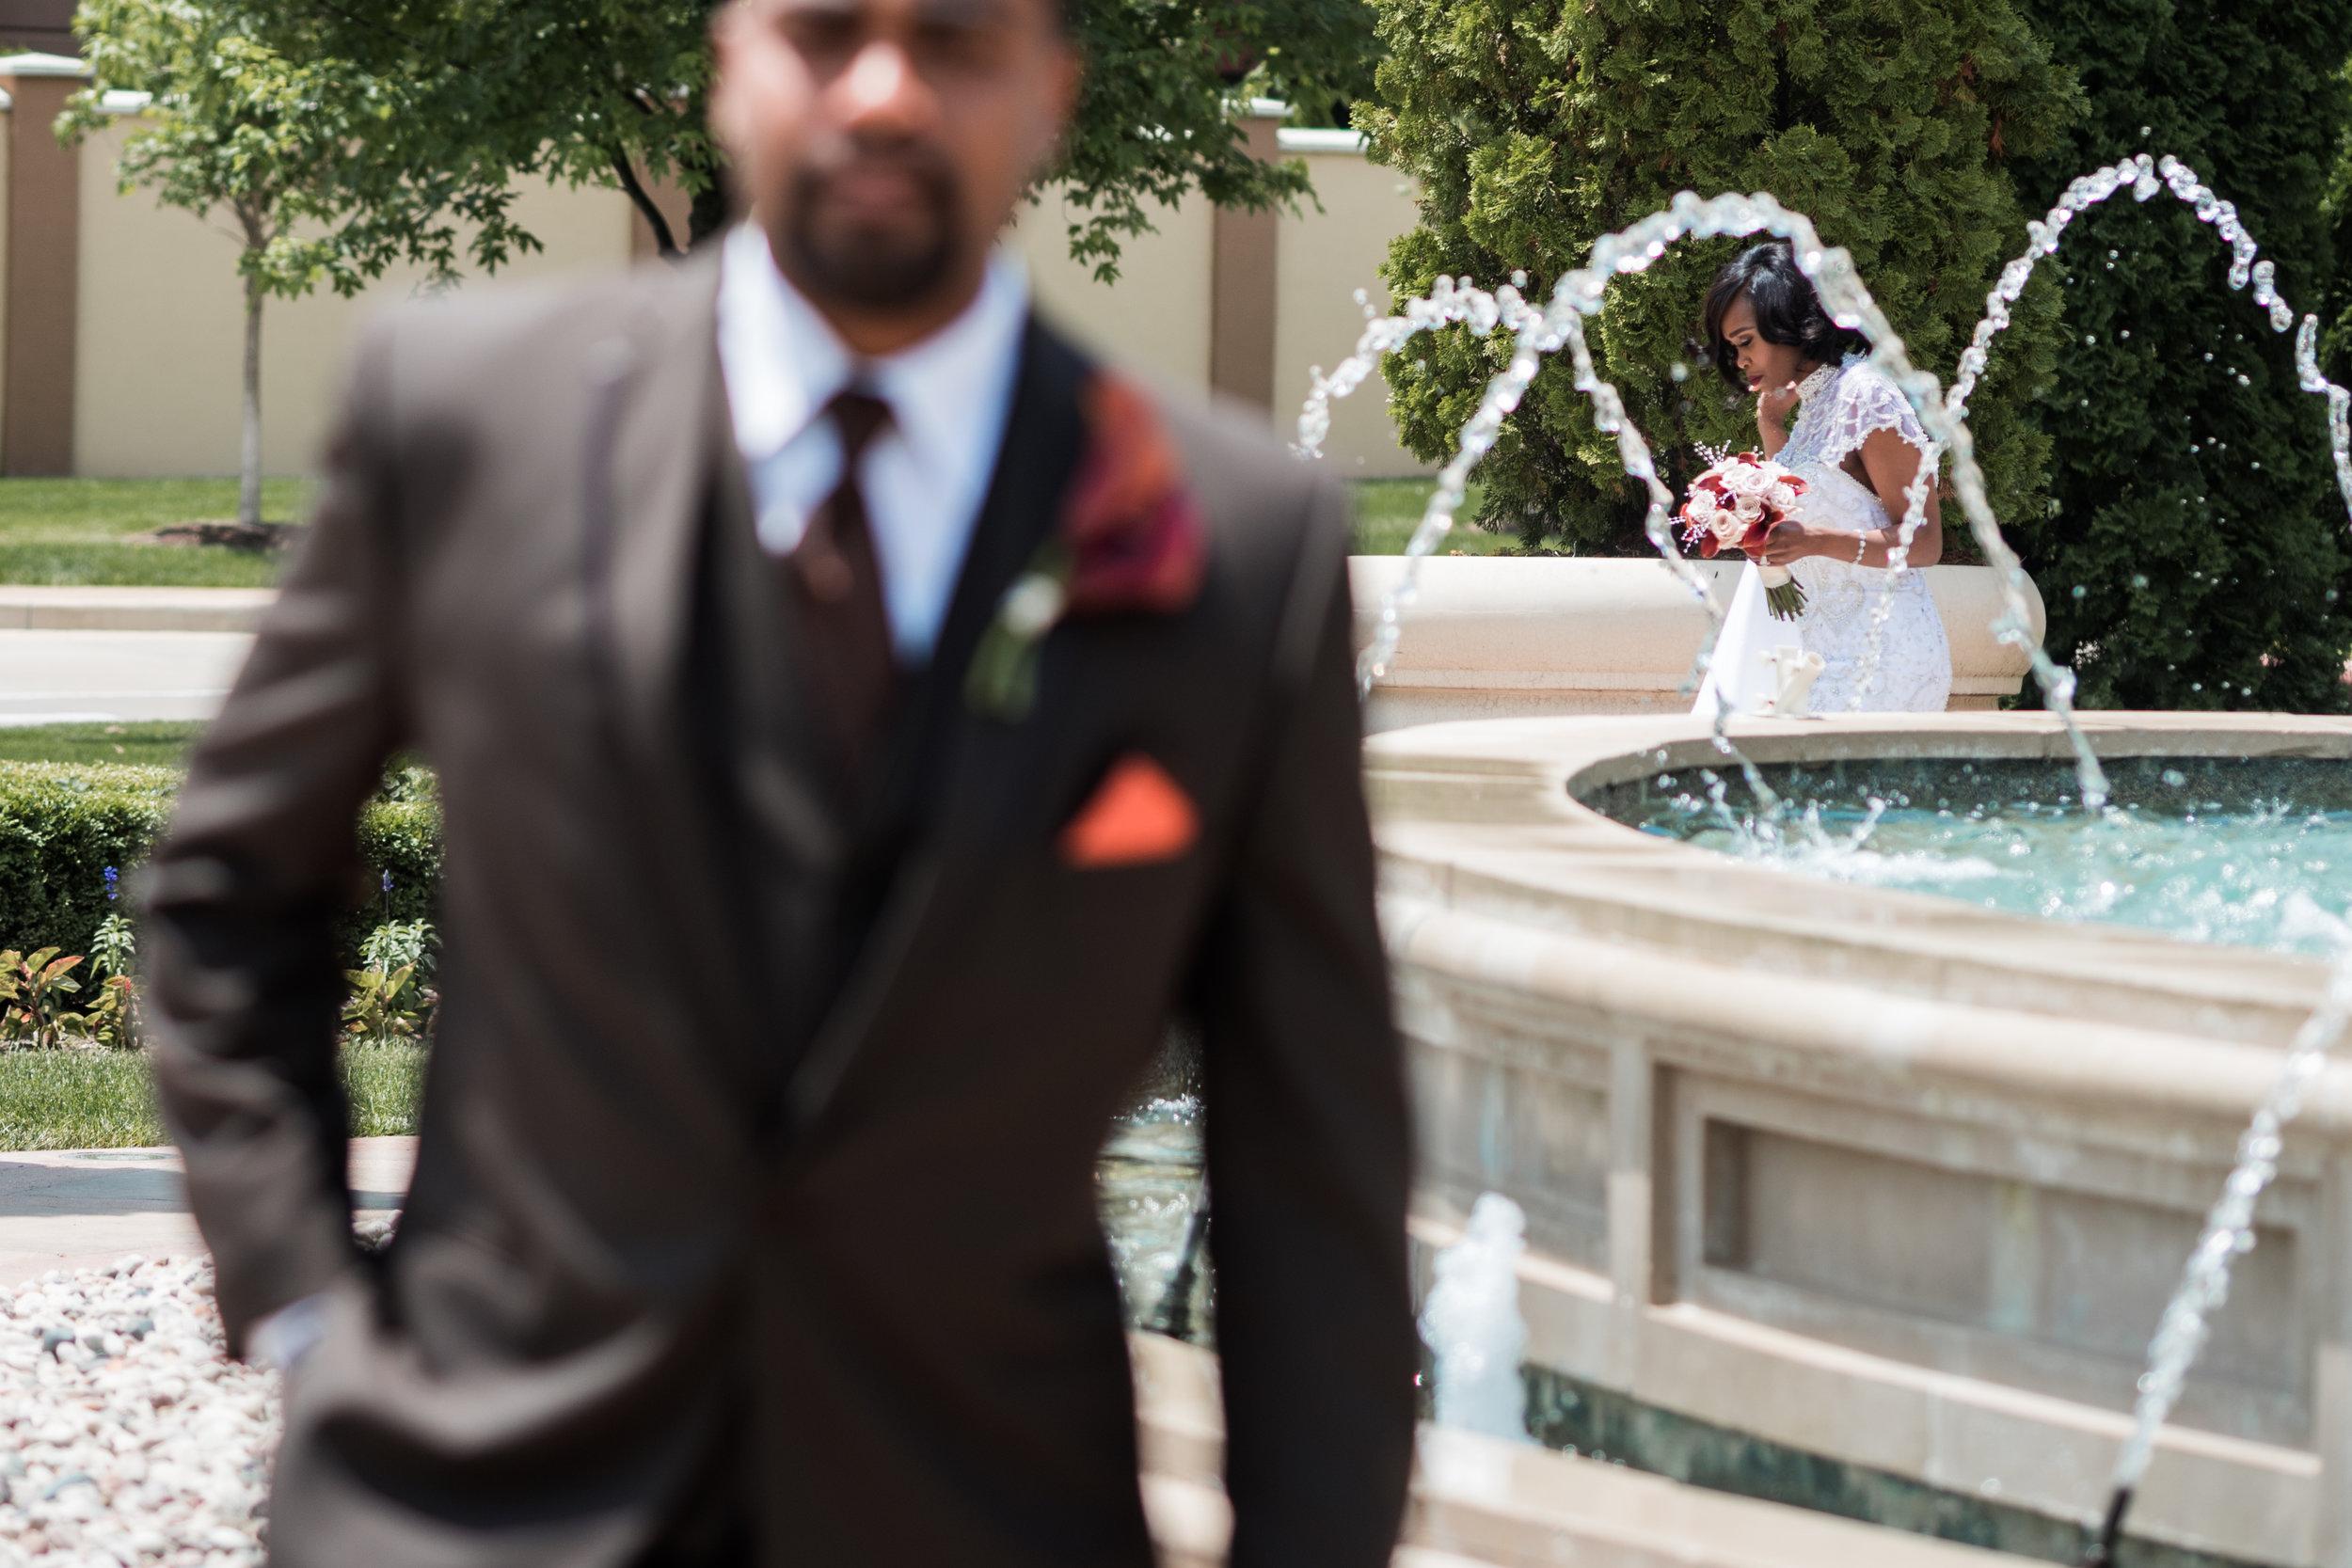 st-louis-wedding-photographer-third-baptist-church-221.jpg